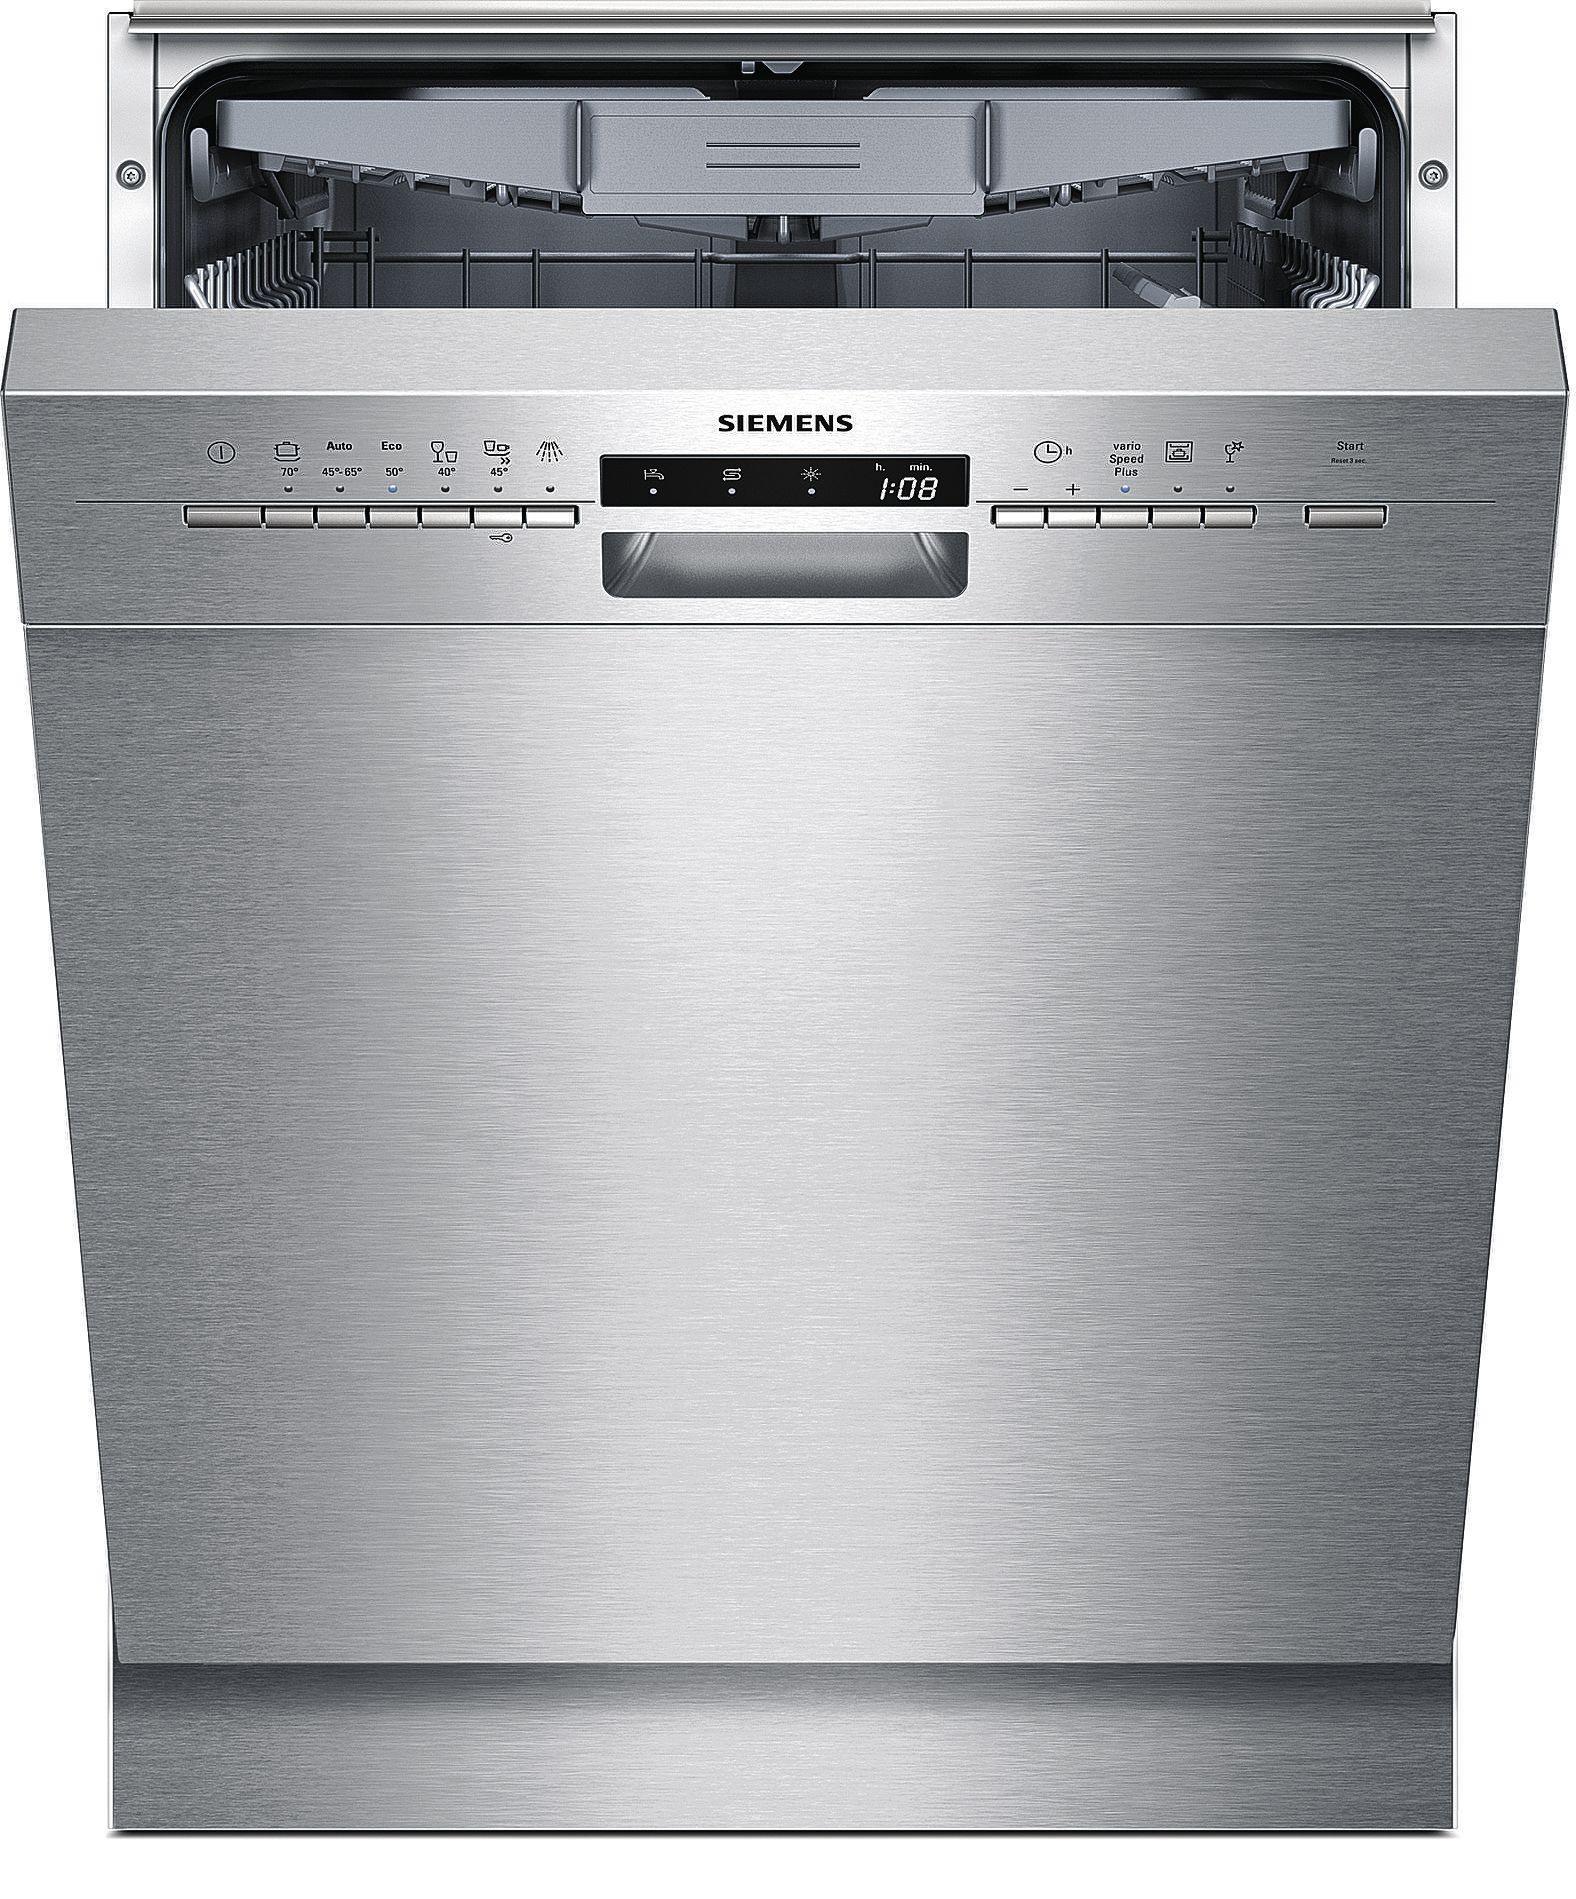 teamsix sn46p582eu edelstahl siemens elektro gro lavastoviglie sottopensile. Black Bedroom Furniture Sets. Home Design Ideas